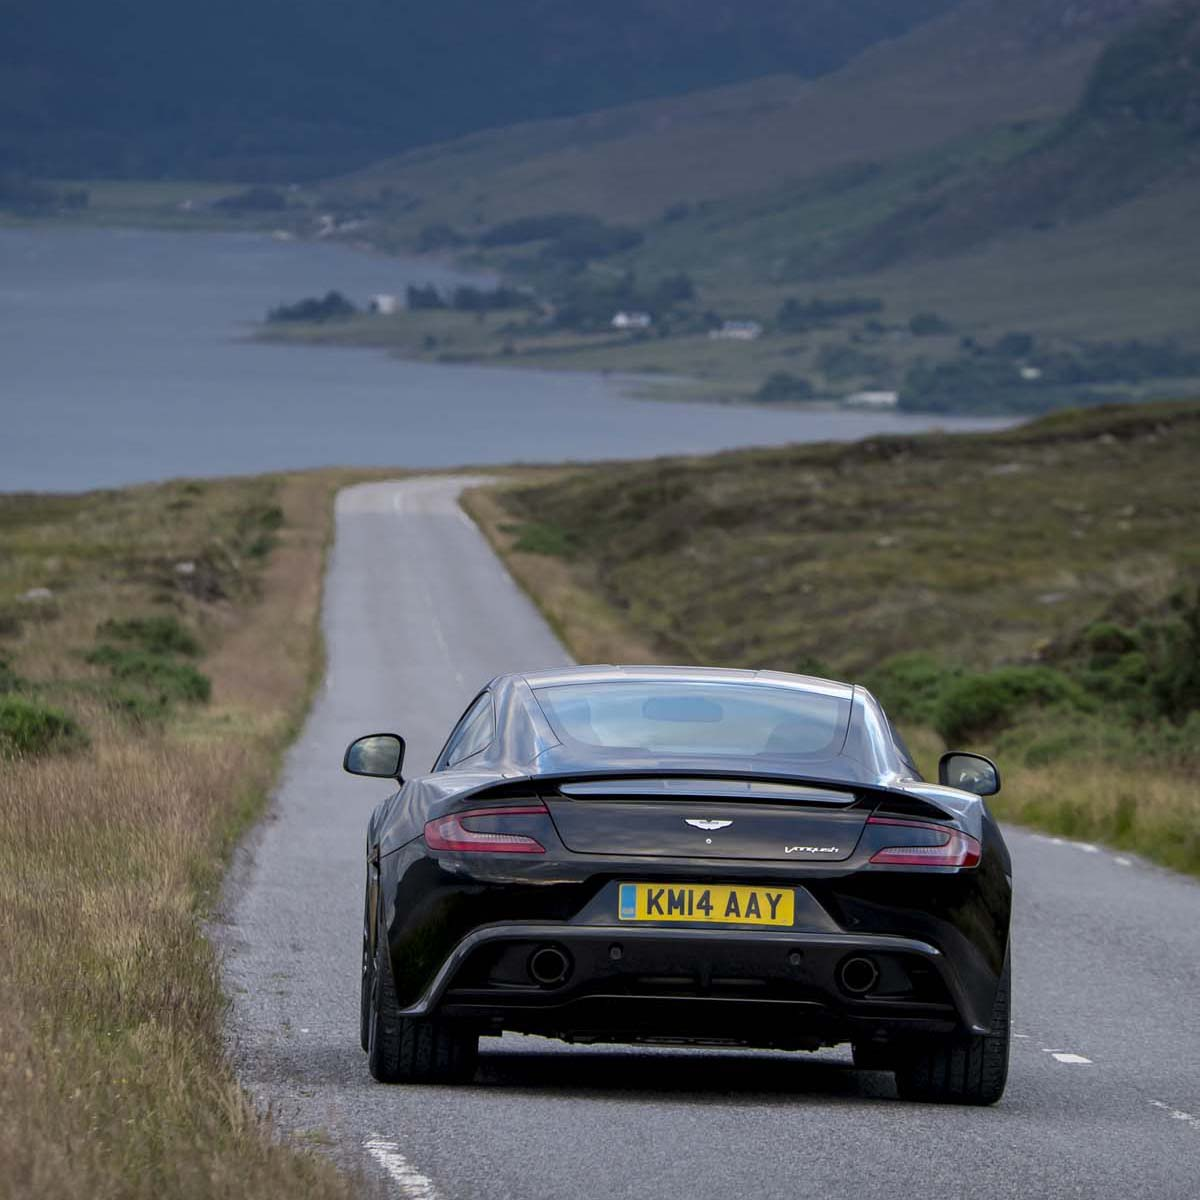 海外試英雄 Aston Martin Vanquish Coupe